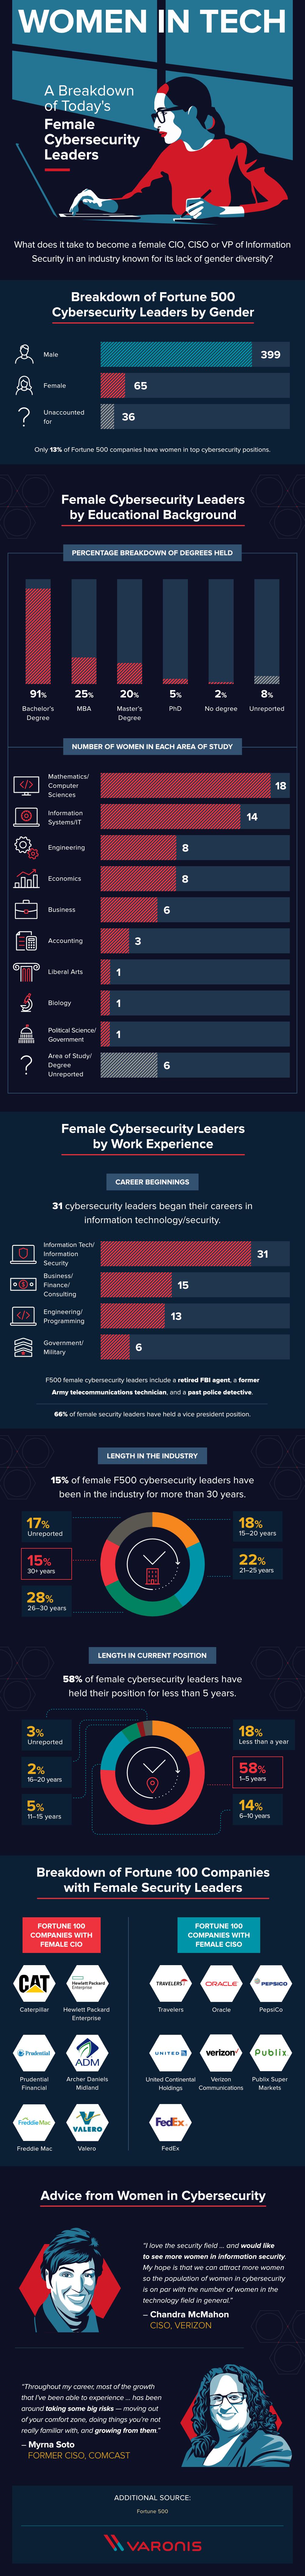 Women In Tech The Anatomy Of A Female Cybersecurity Leader